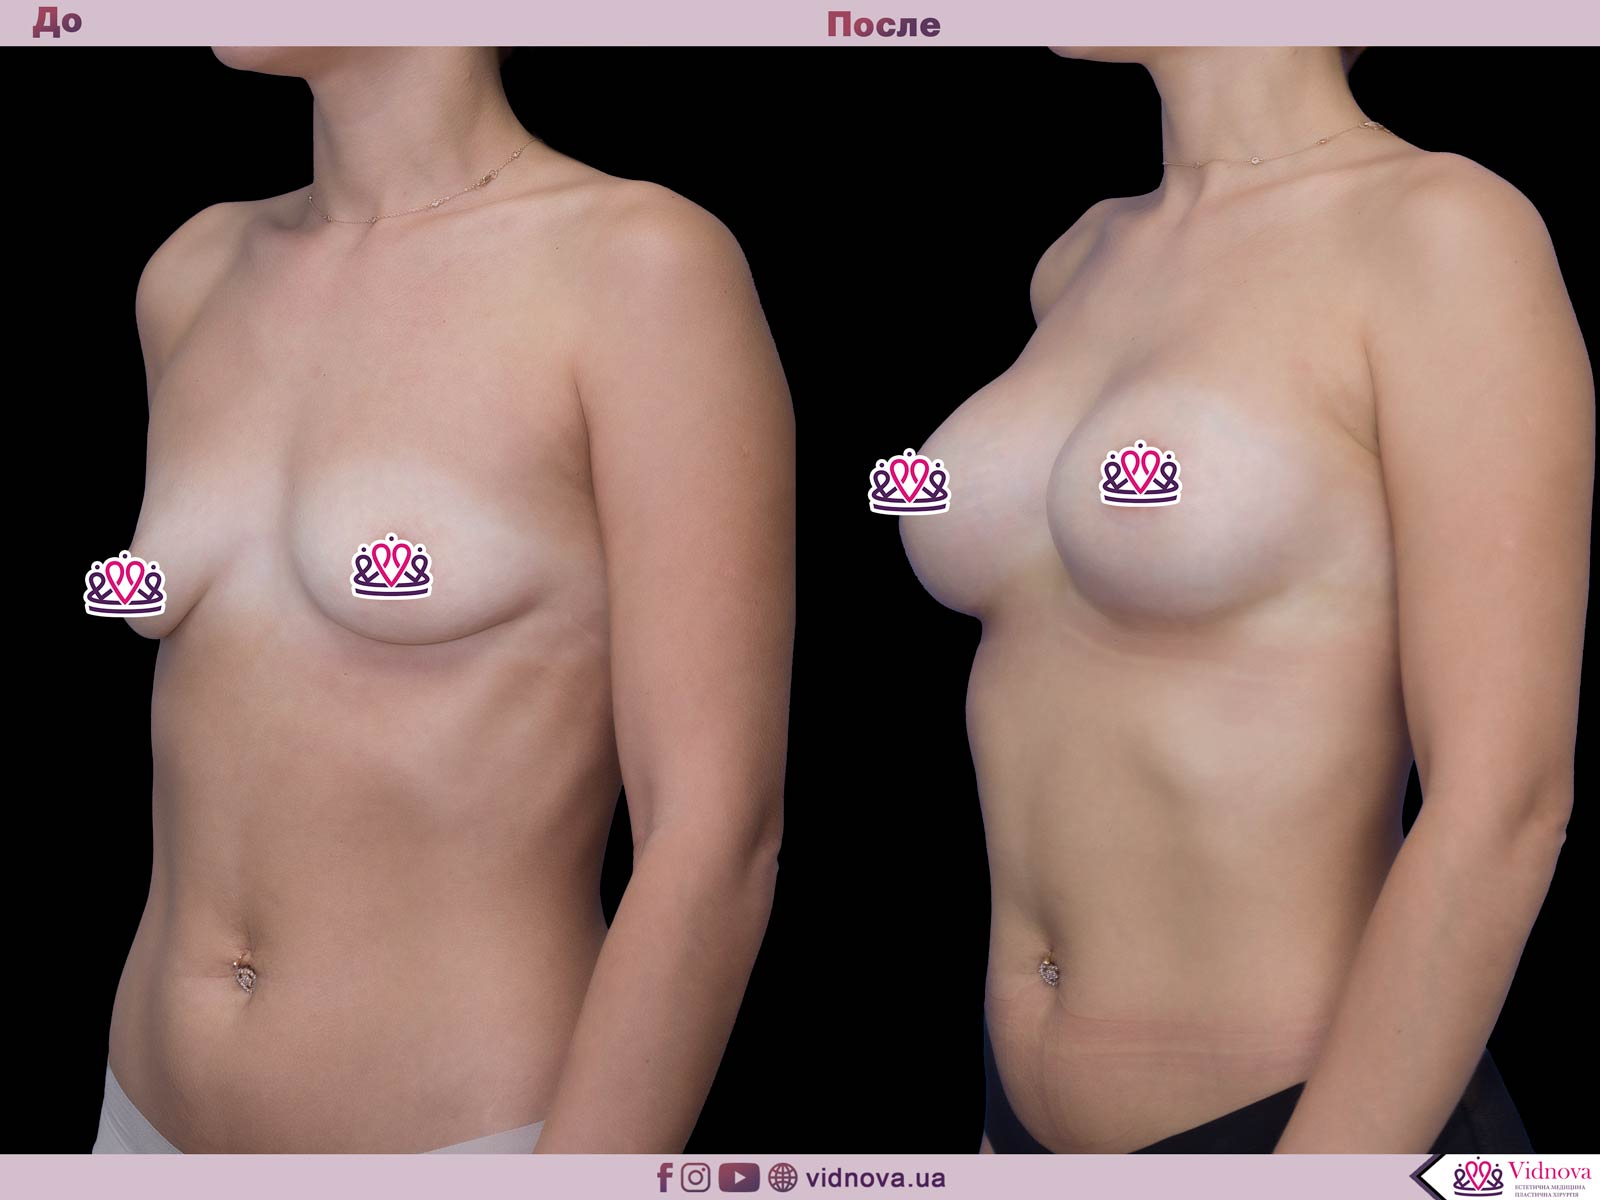 Увеличение груди: Фото ДО и ПОСЛЕ - Пример №43-2 - Клиника Vidnova